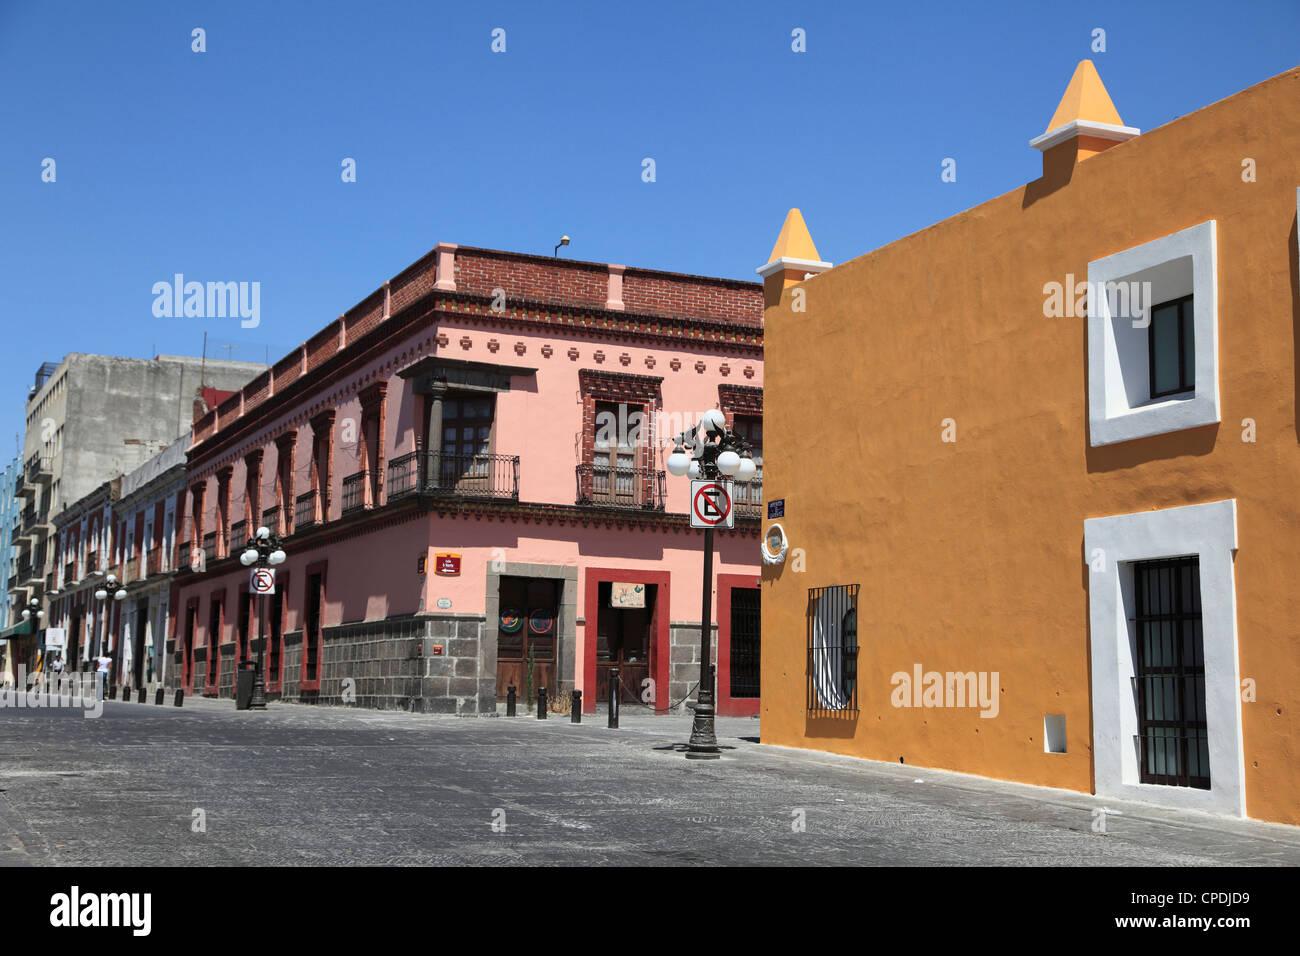 Street scene and colonial architecture, Puebla, Historic Center, UNESCO World Heritage Site, Puebla State, Mexico, - Stock Image